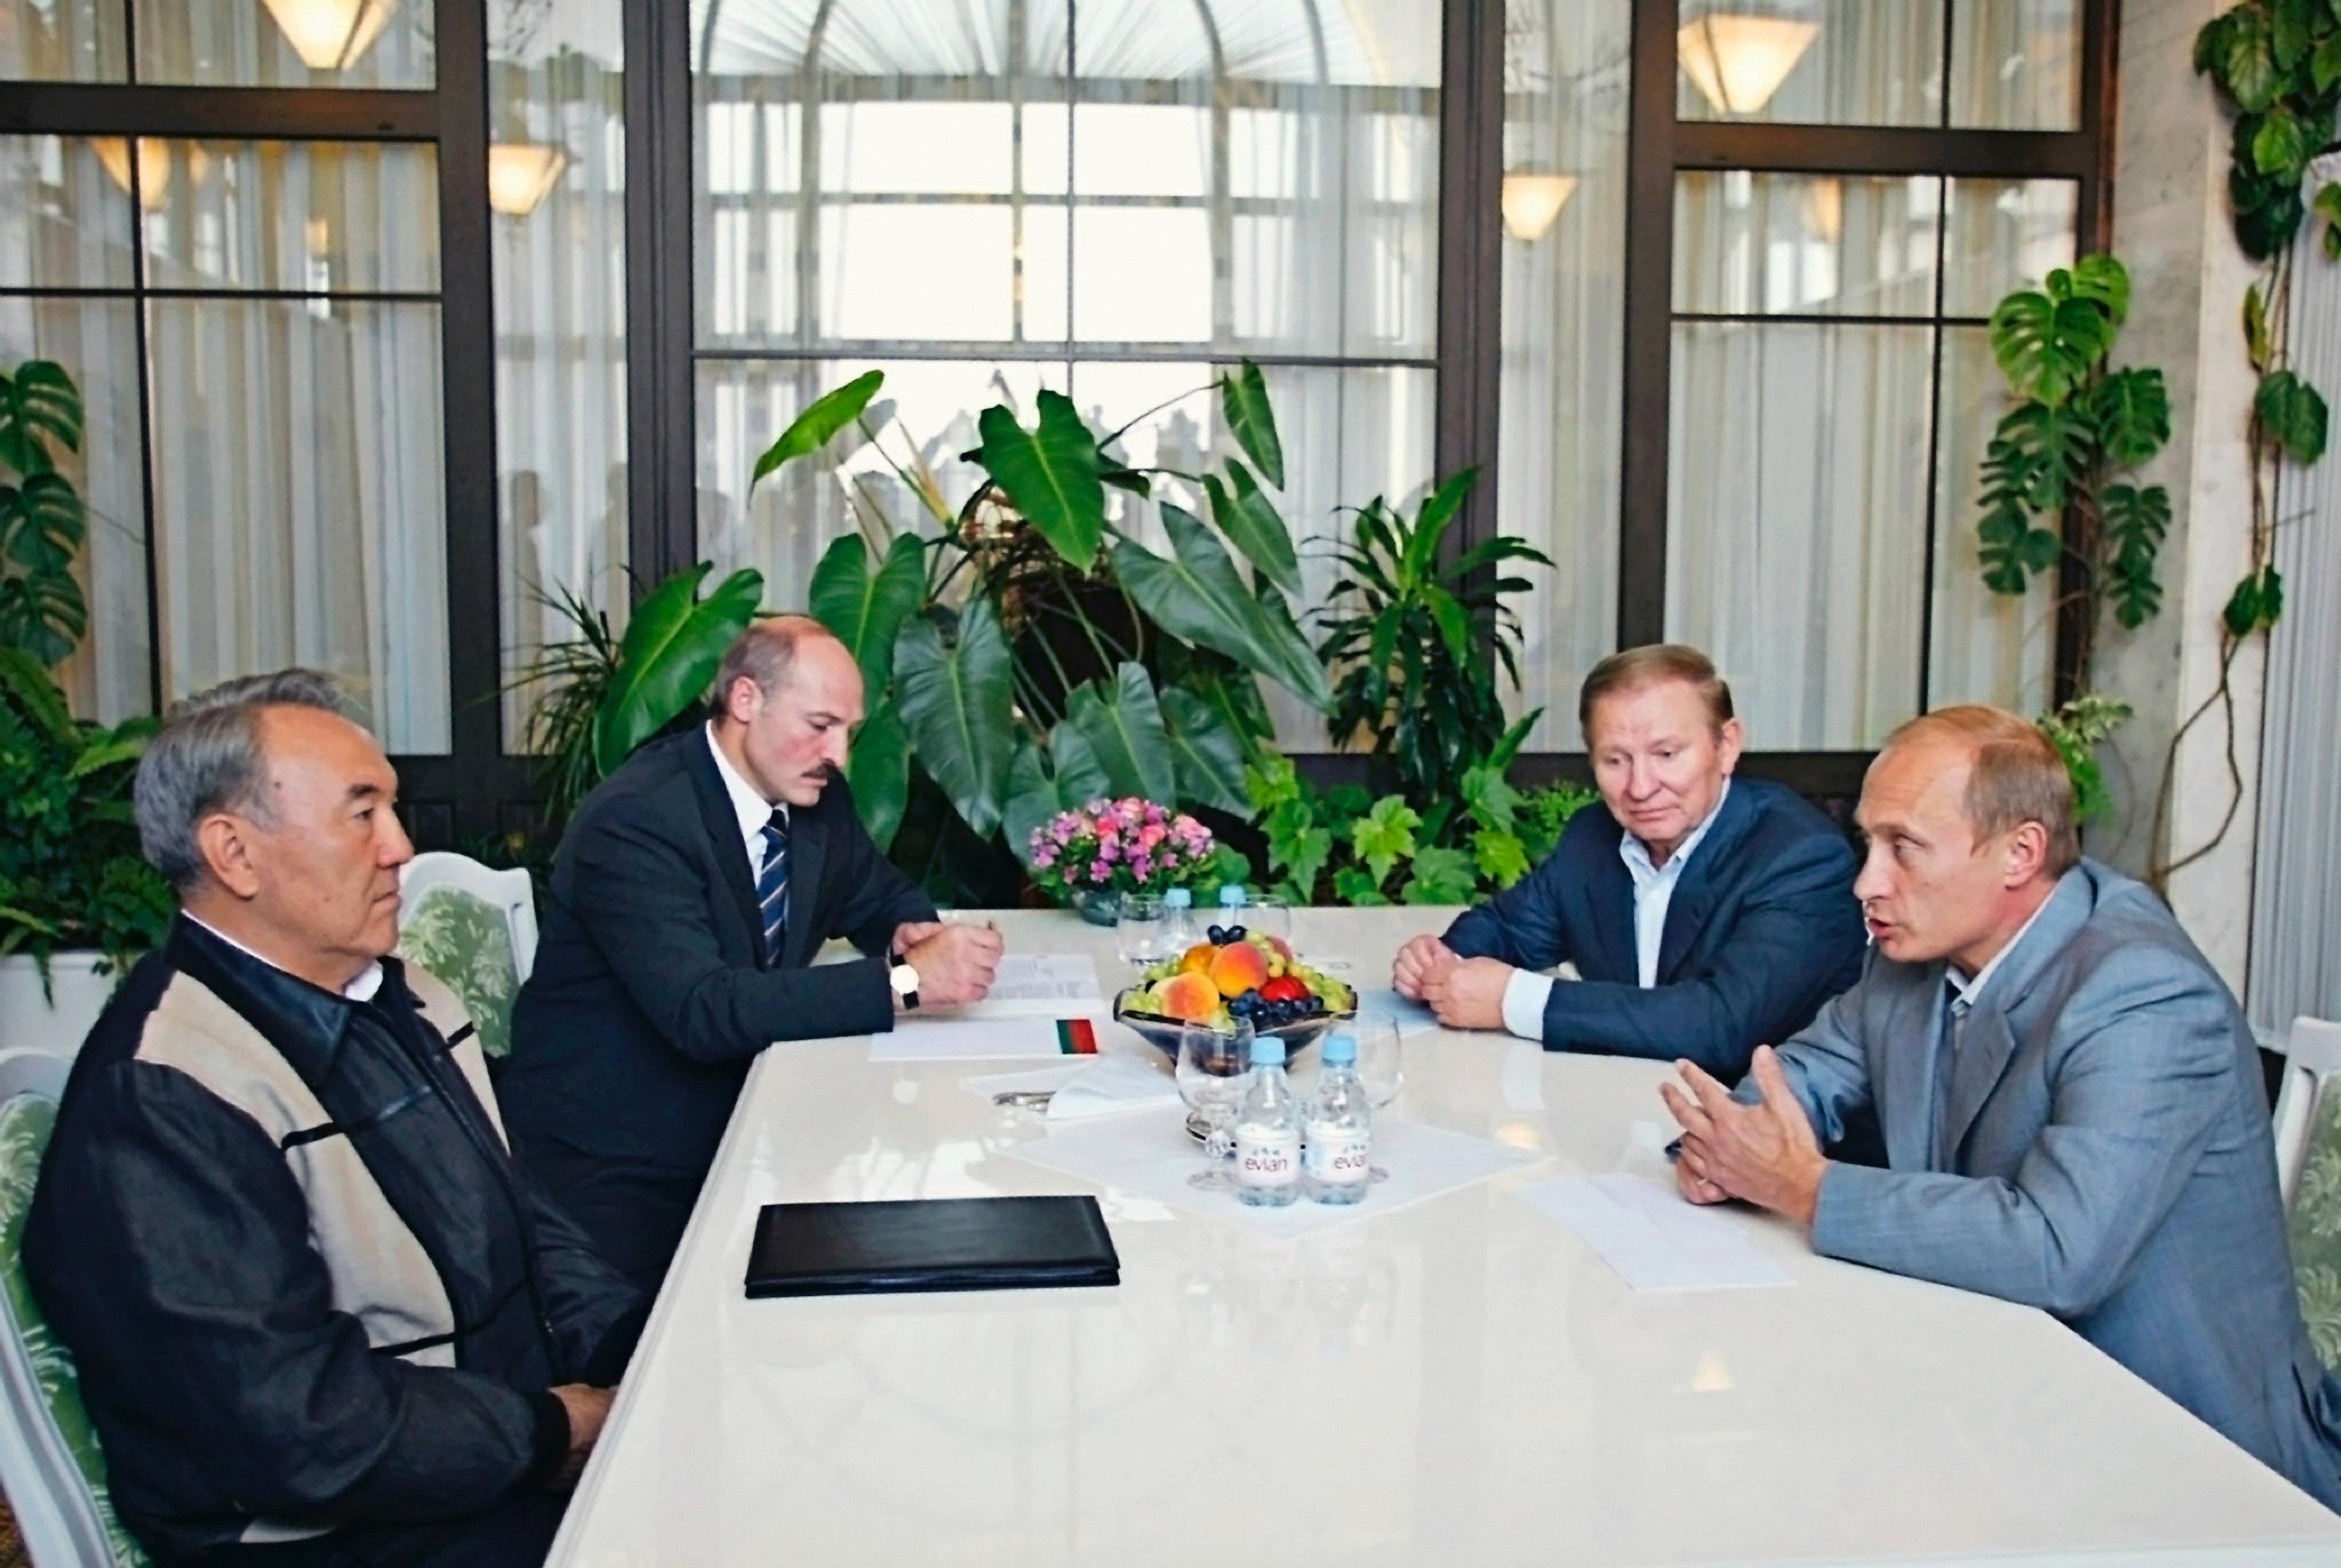 Томик Макиавелли: Лукашенко подарил Кучме плюшевого петуха, аКучма вответ